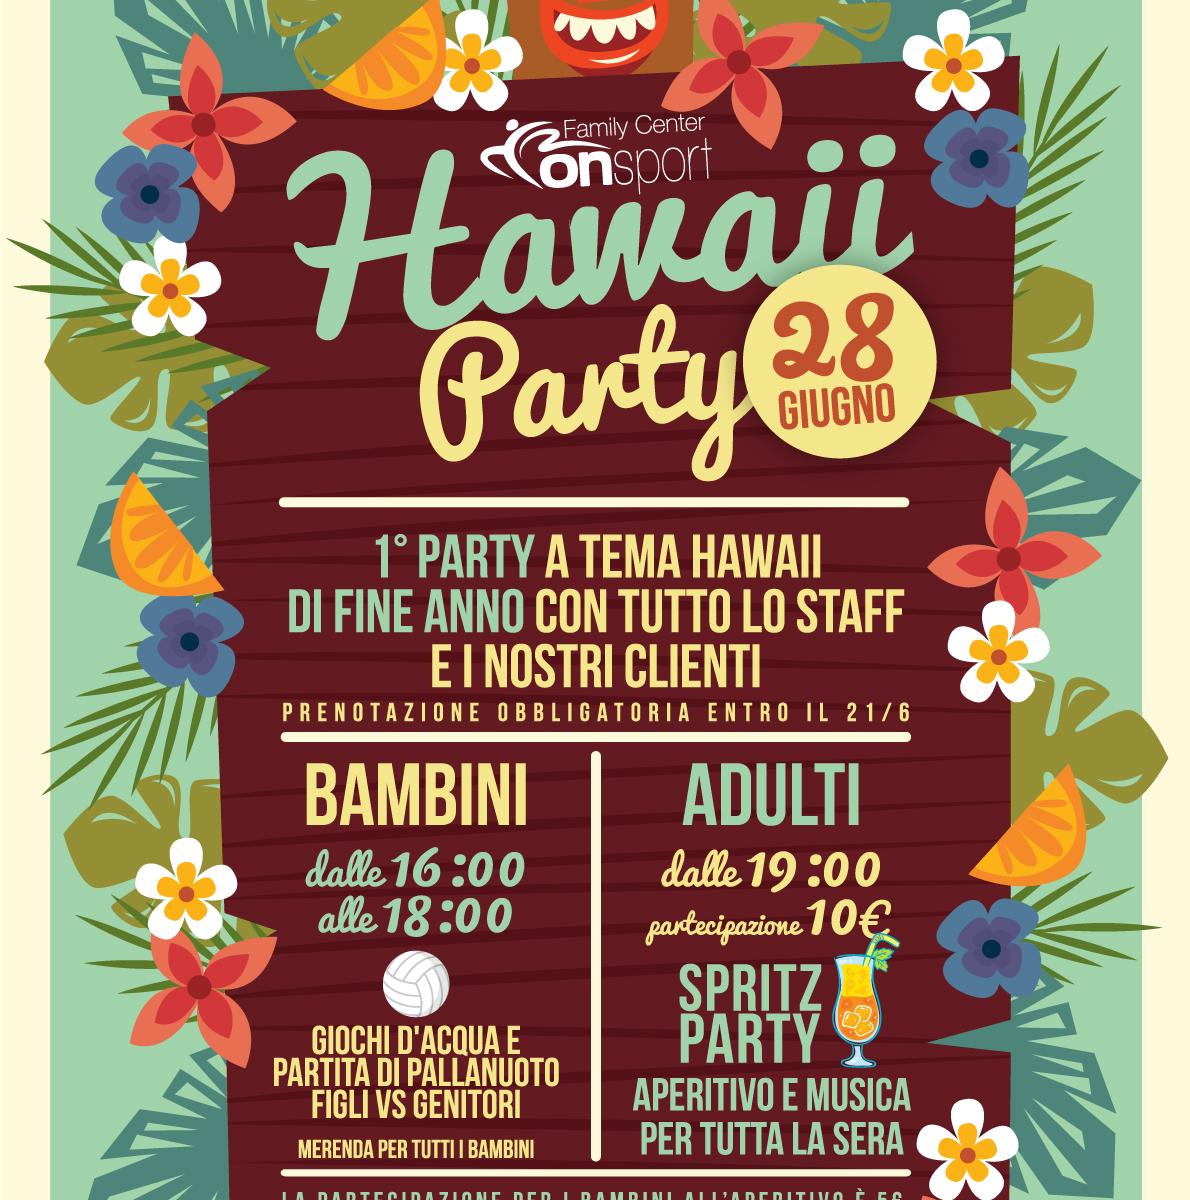 Hawaii party - 28 giugno - Vinovo